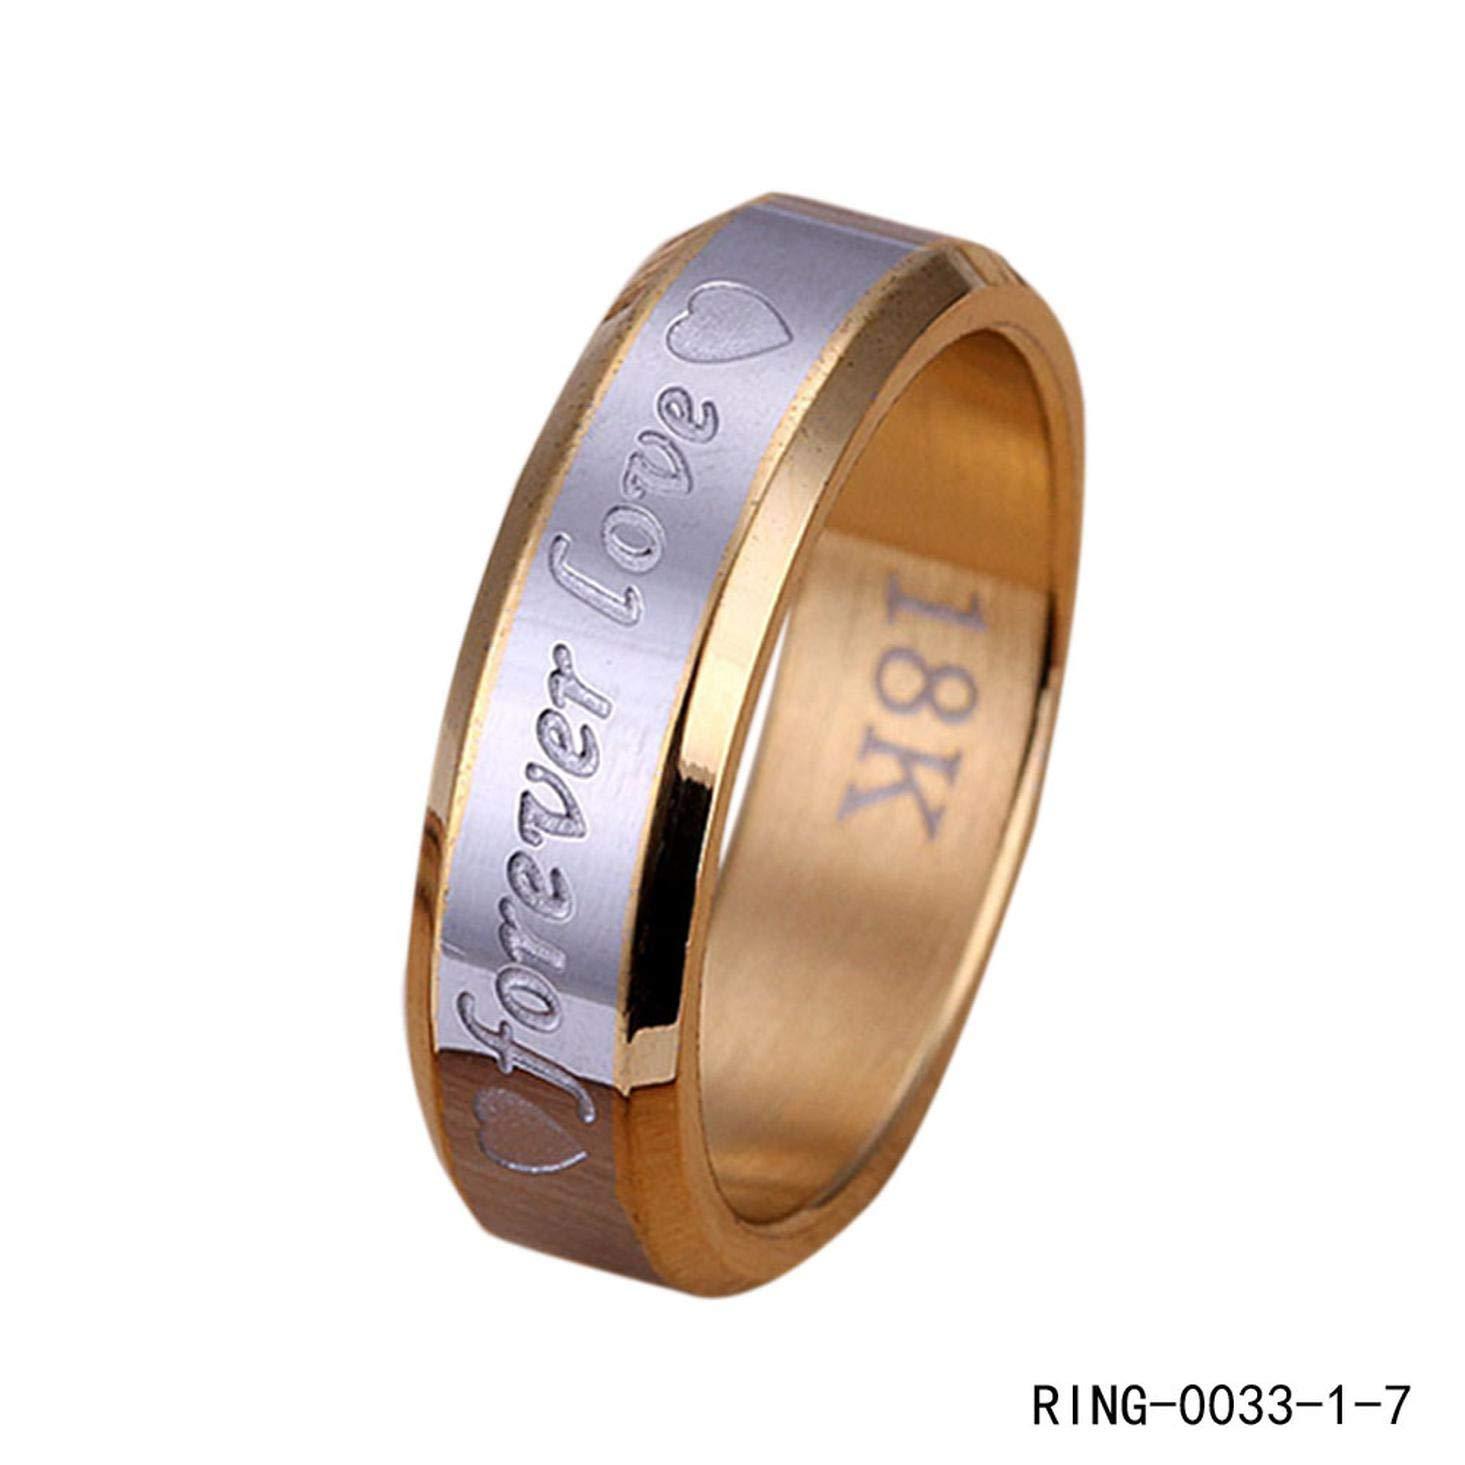 Und Weiseset Damen Botreelife Frauen Blatt Armband Armband